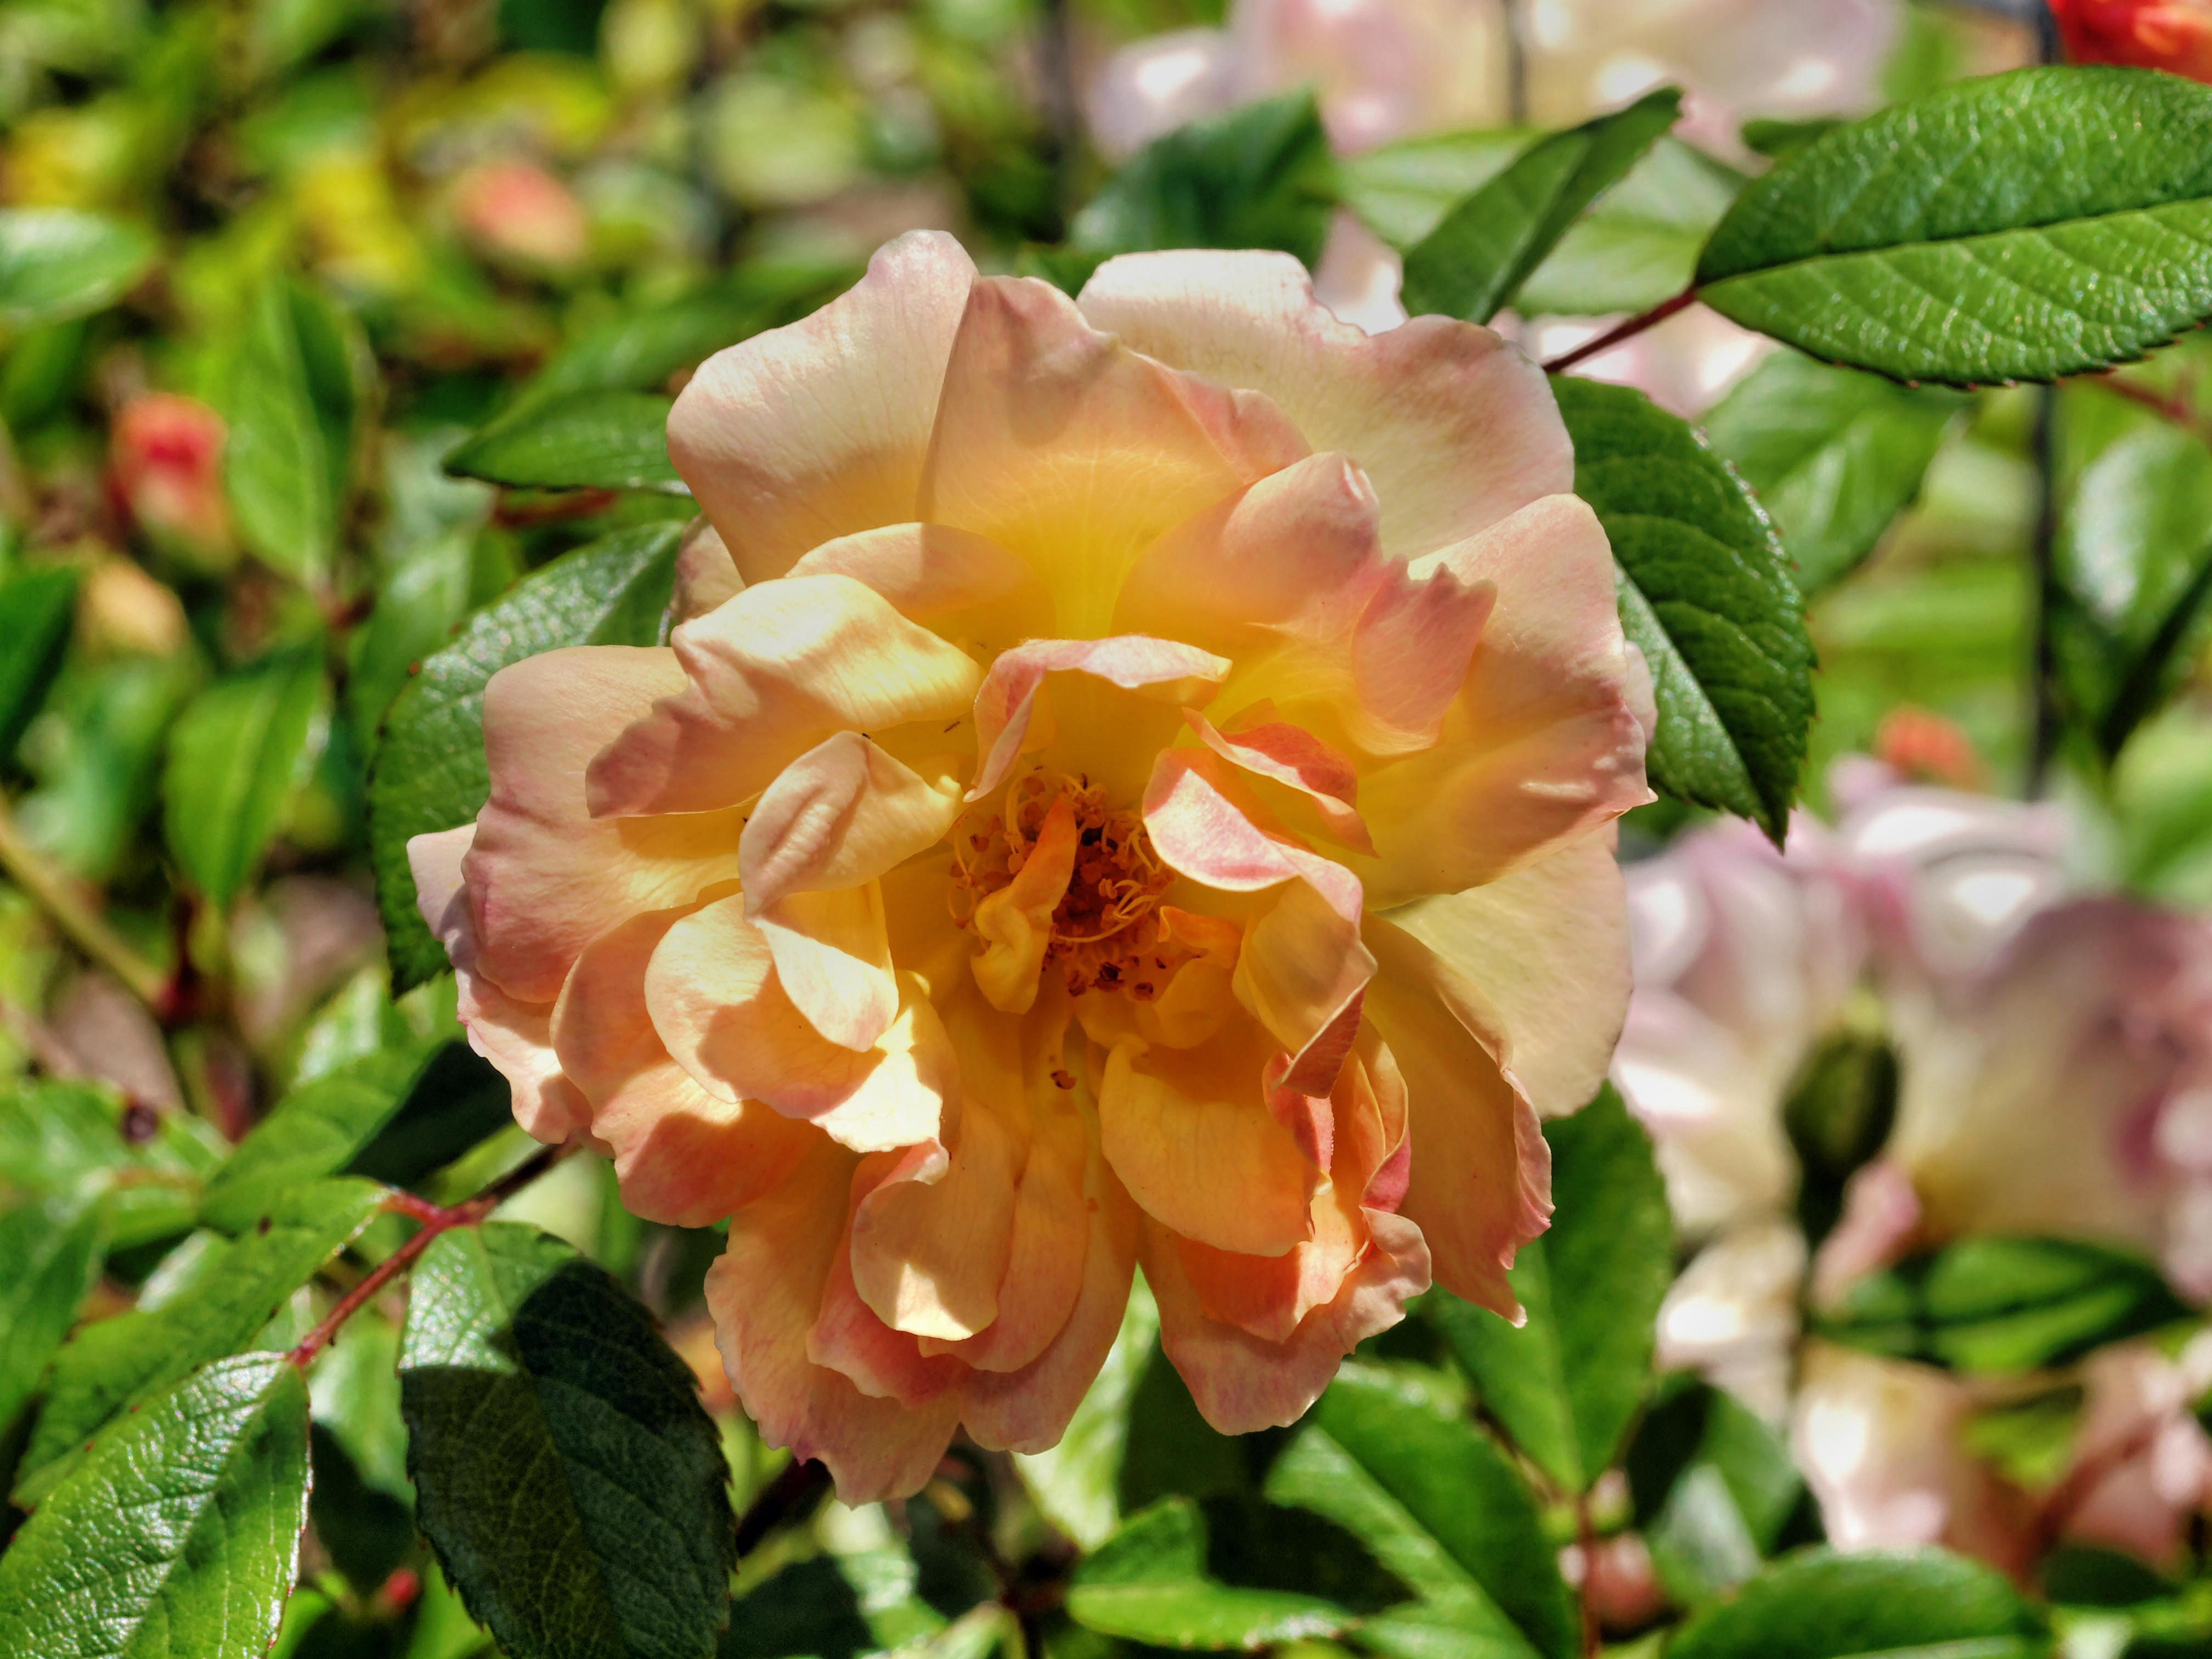 Rosa-Phyllis-Bide-1.jpeg